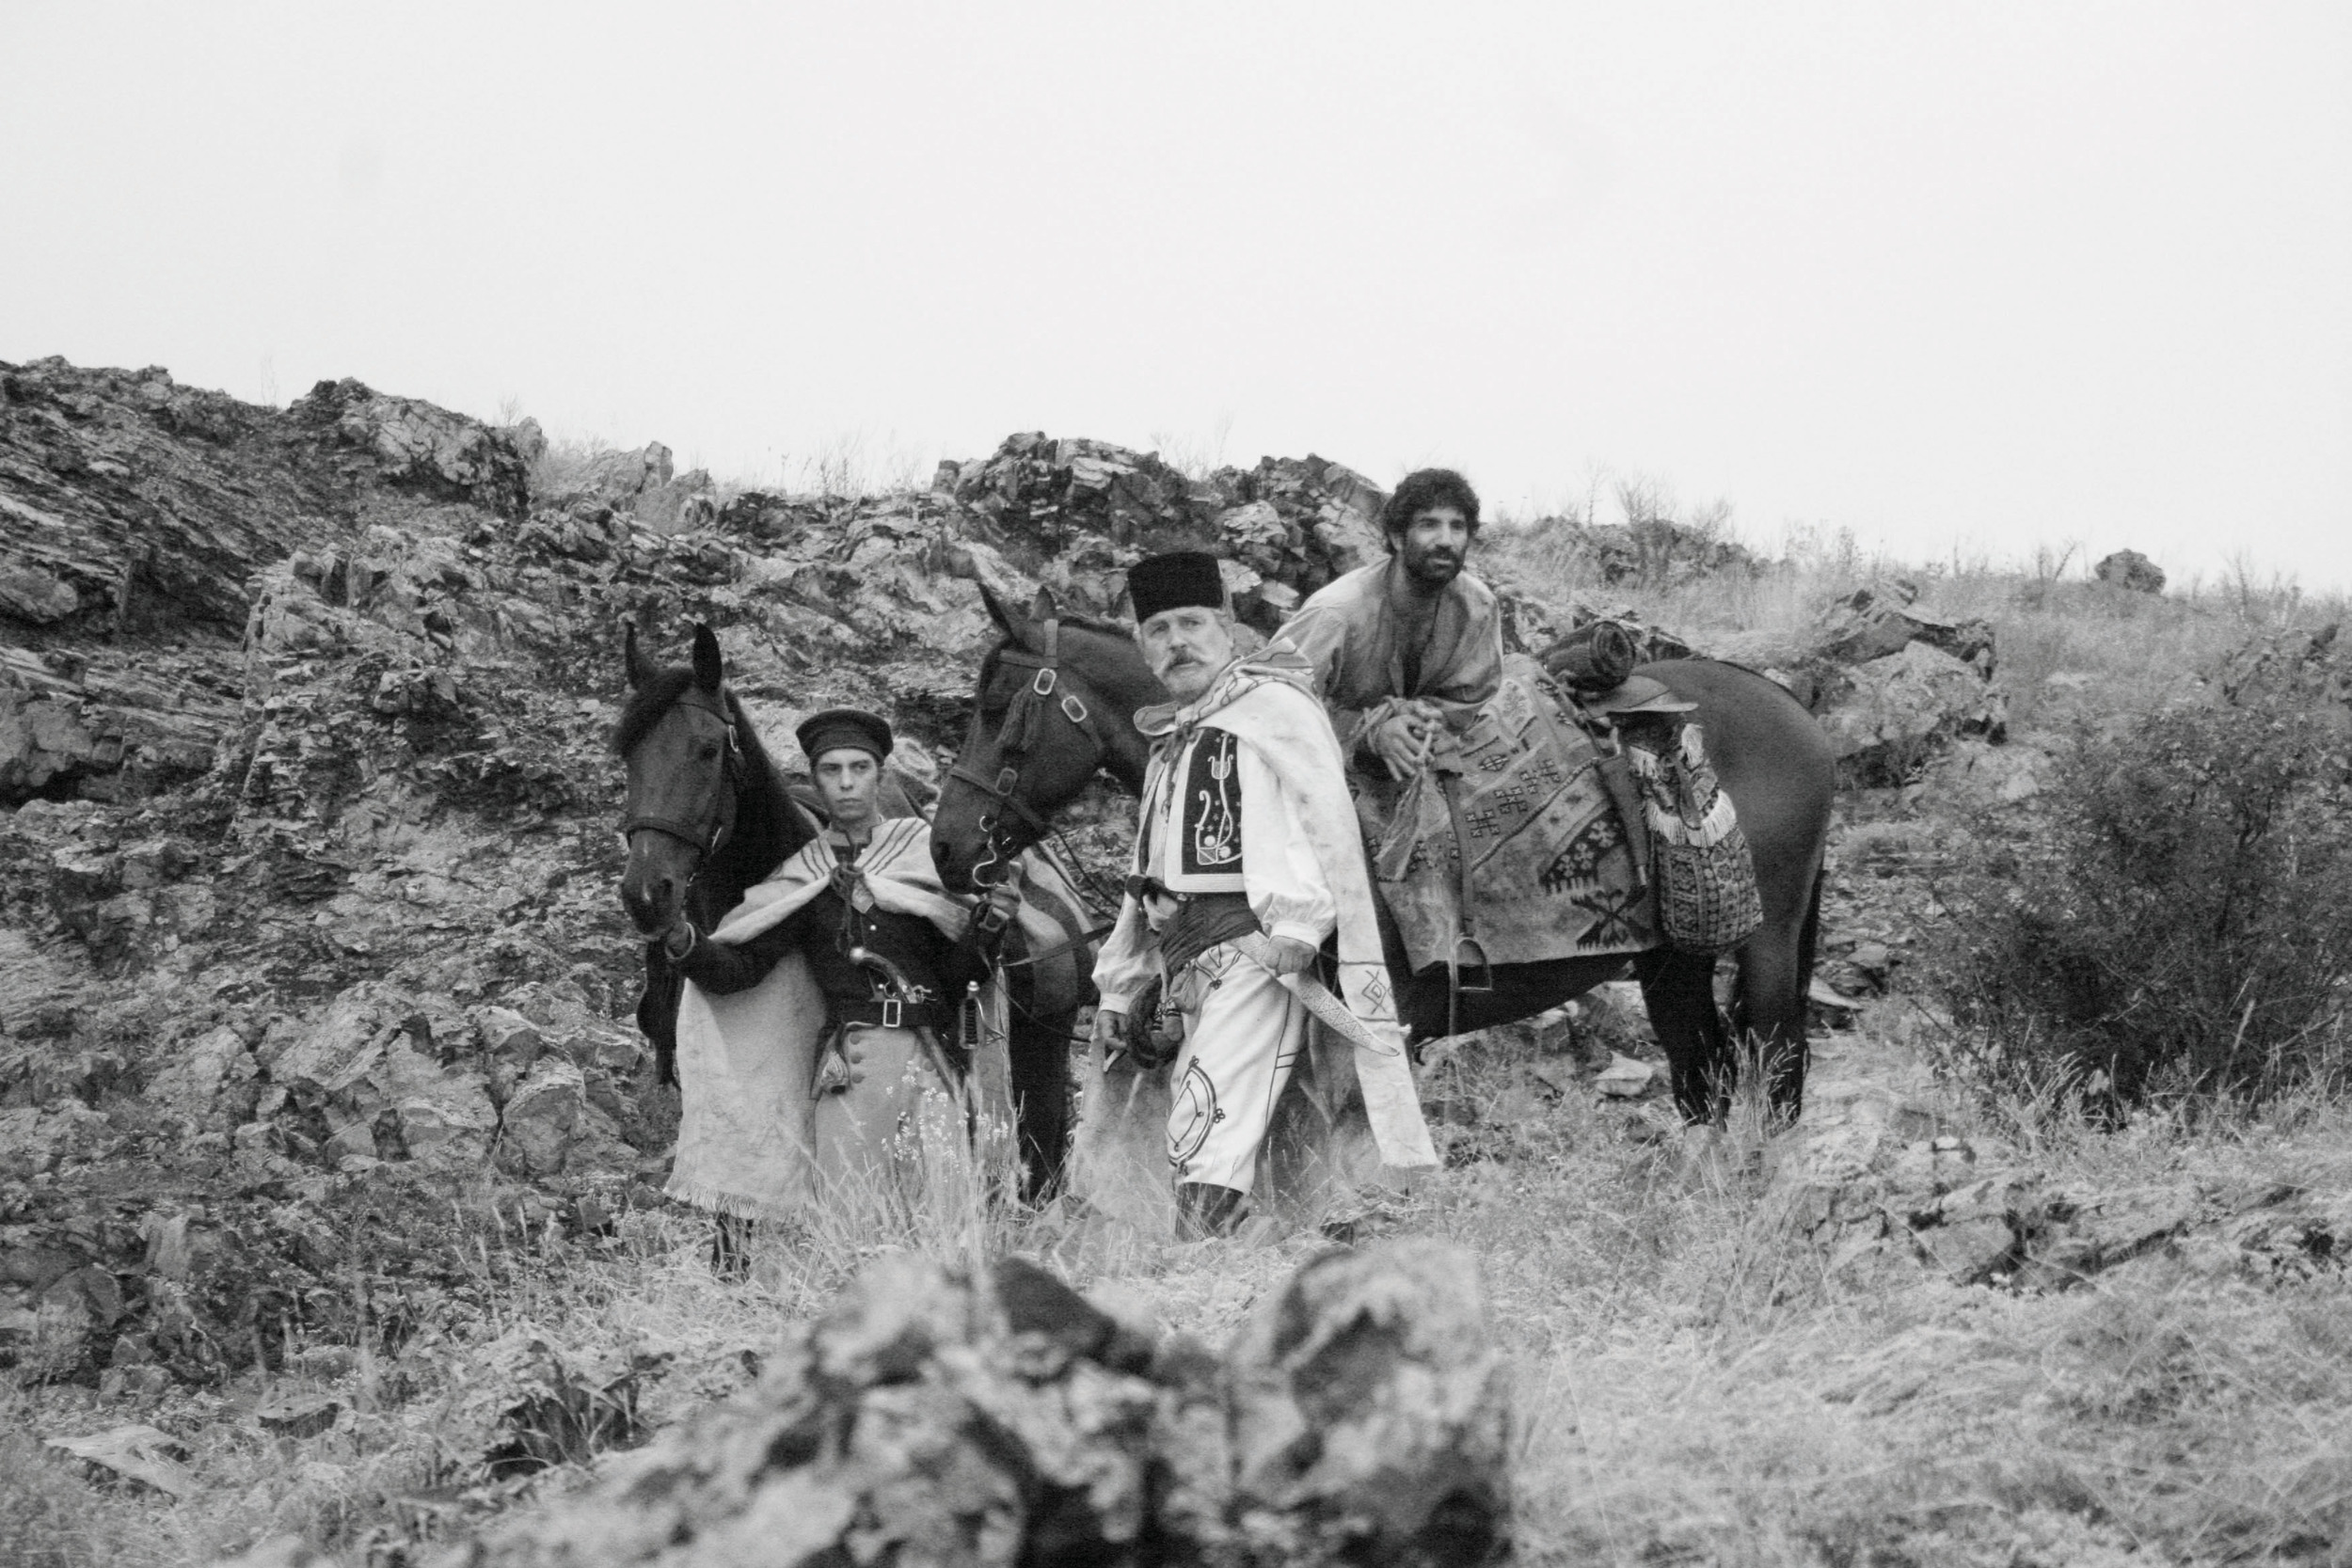 Mihai Comānoiu (Ionitā), Teodor Corban (Costandin) and Cuzin Toma (Carfin).